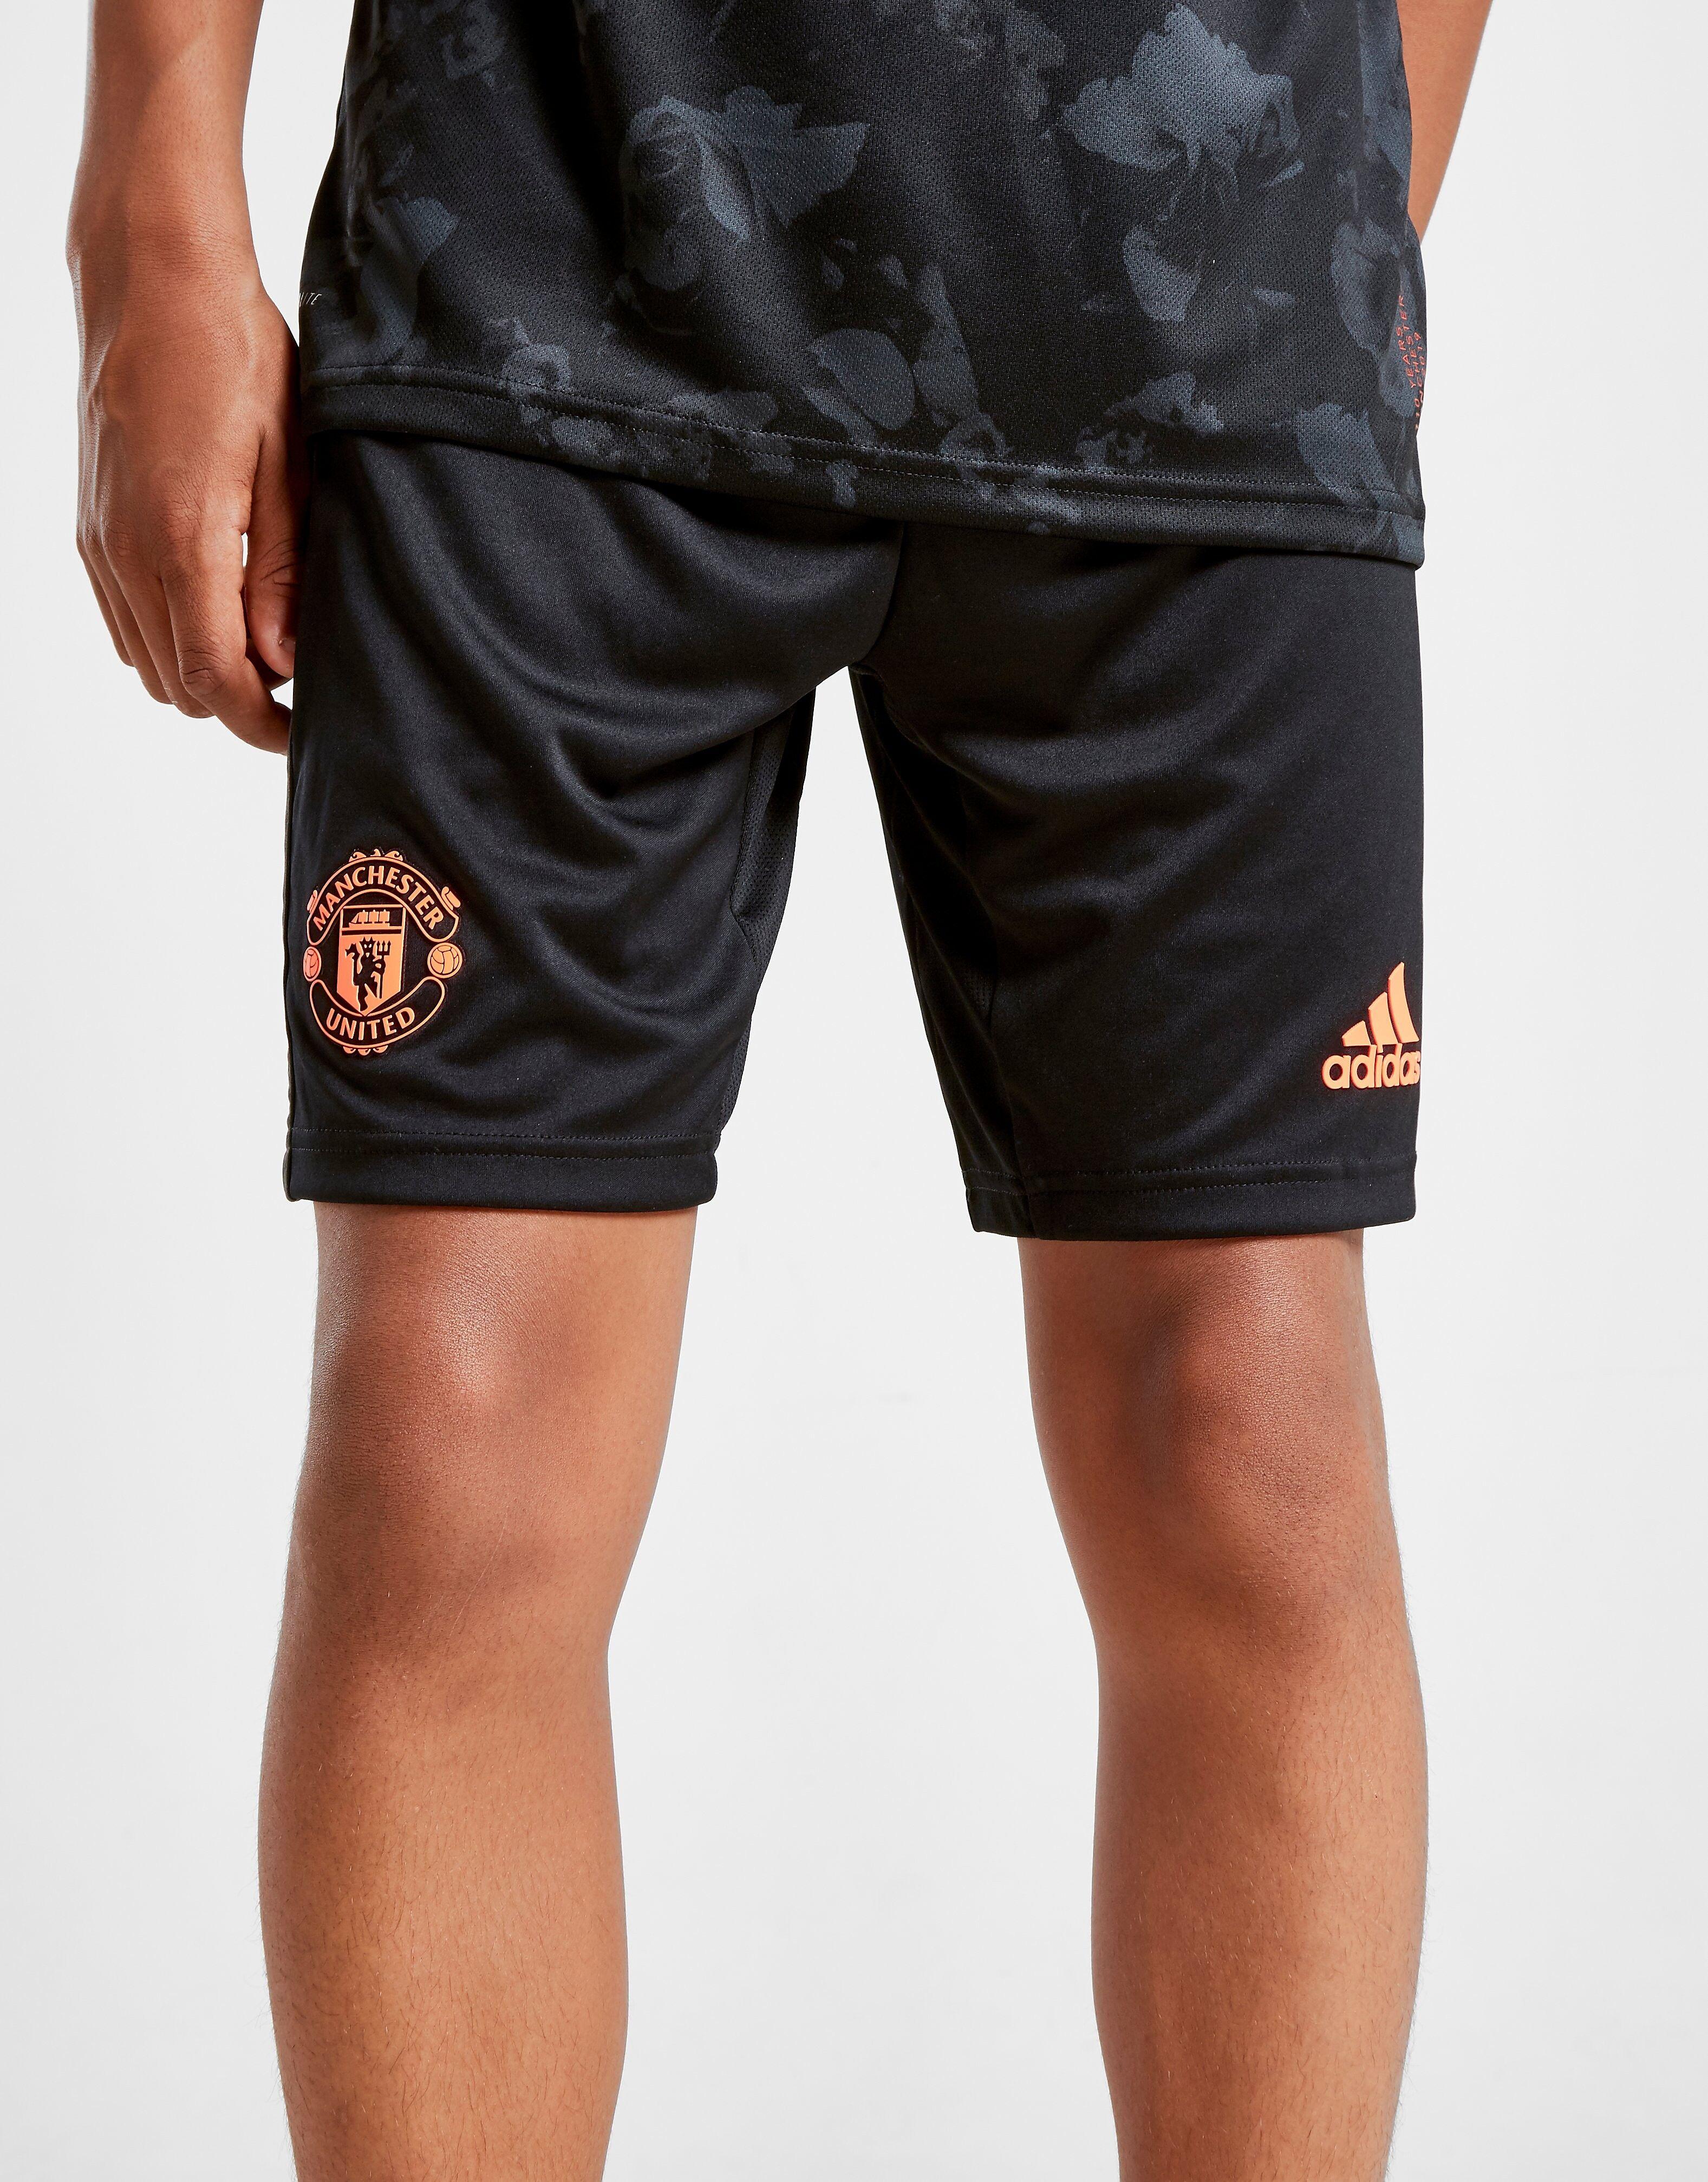 Image of Adidas Manchester United FC 2019/20 Kolmannet Shortsit Juniorit - Kids, Musta